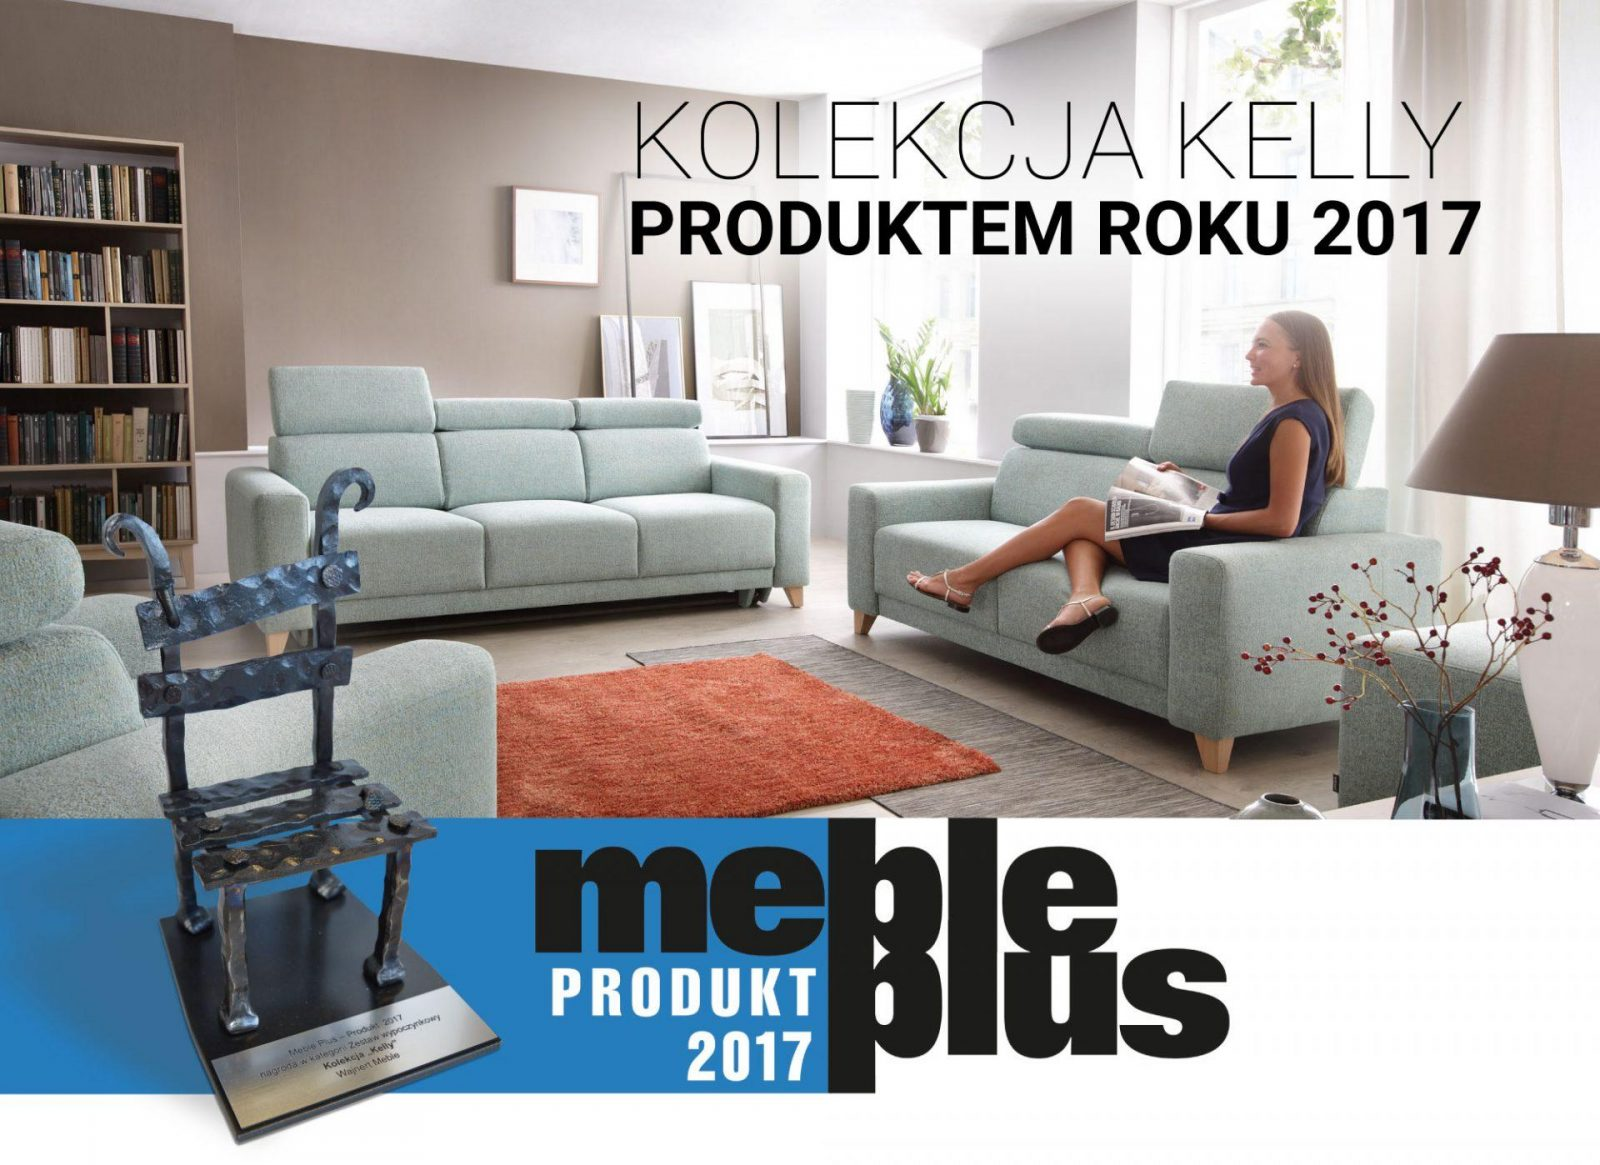 kelly-produkt-roku-2017